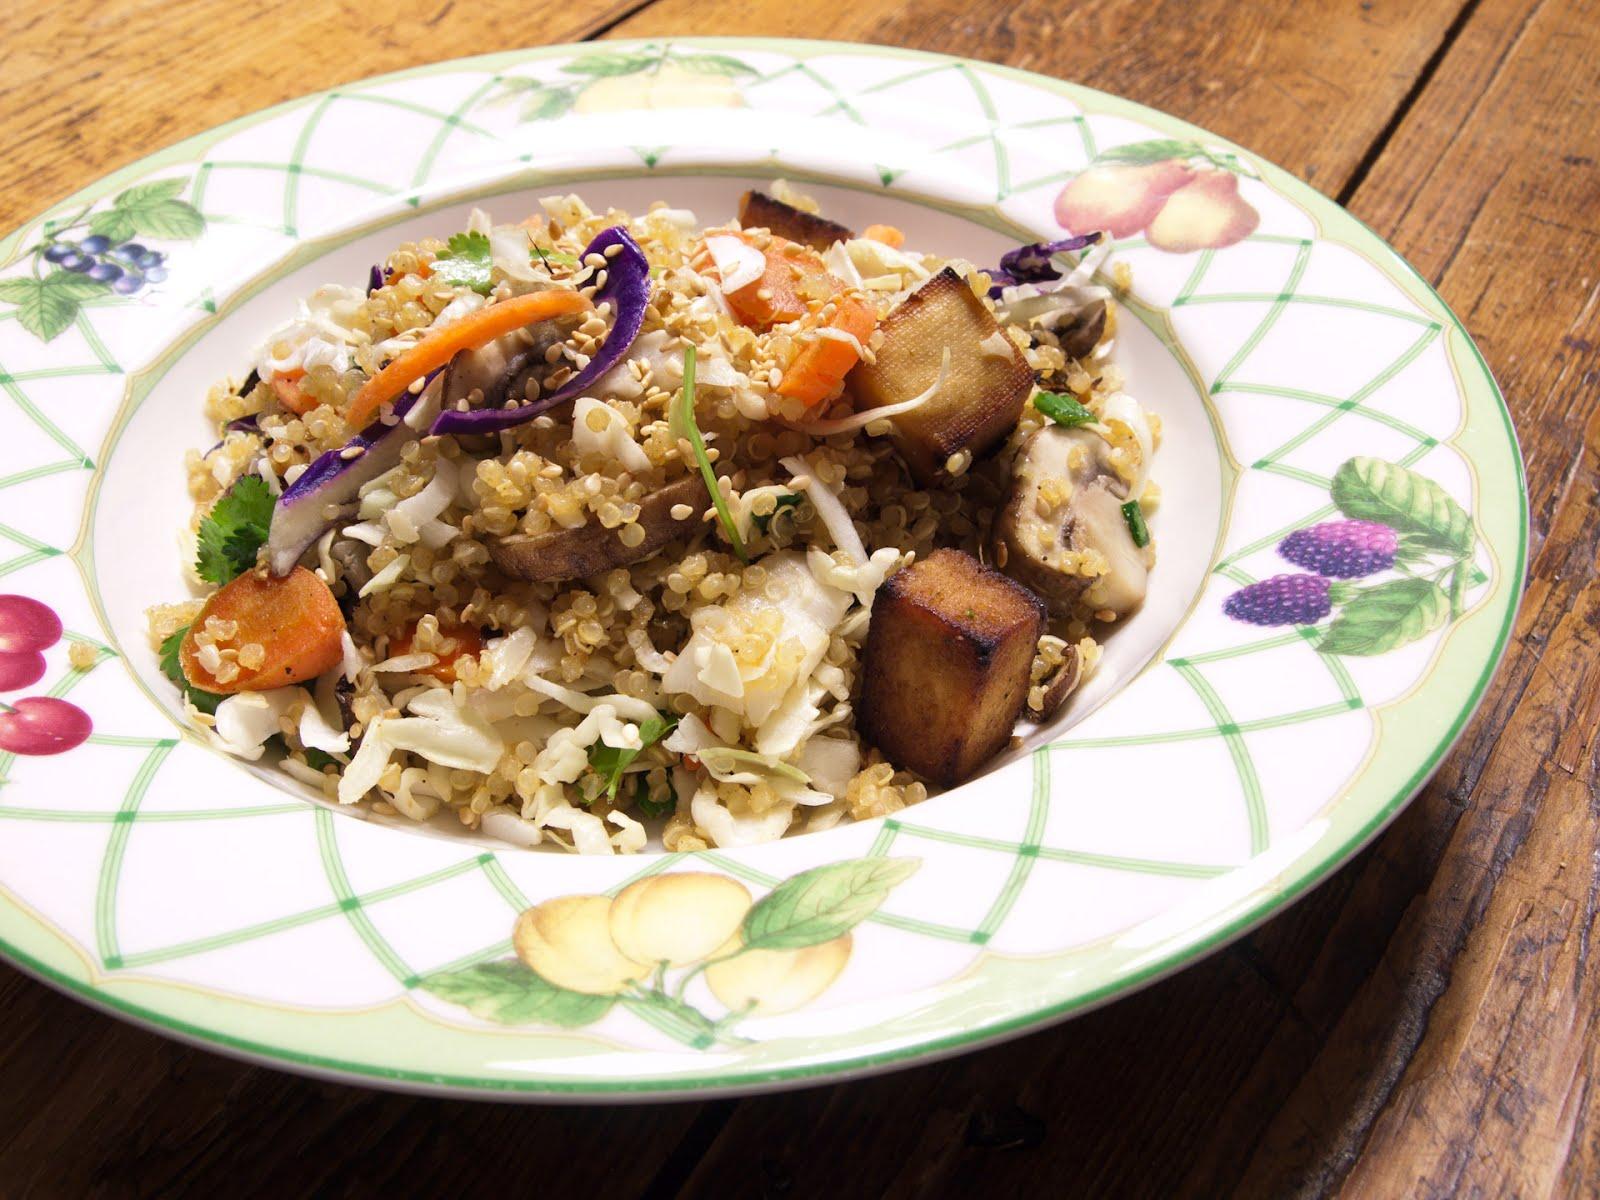 Baked tofu & veggie quinoa salad